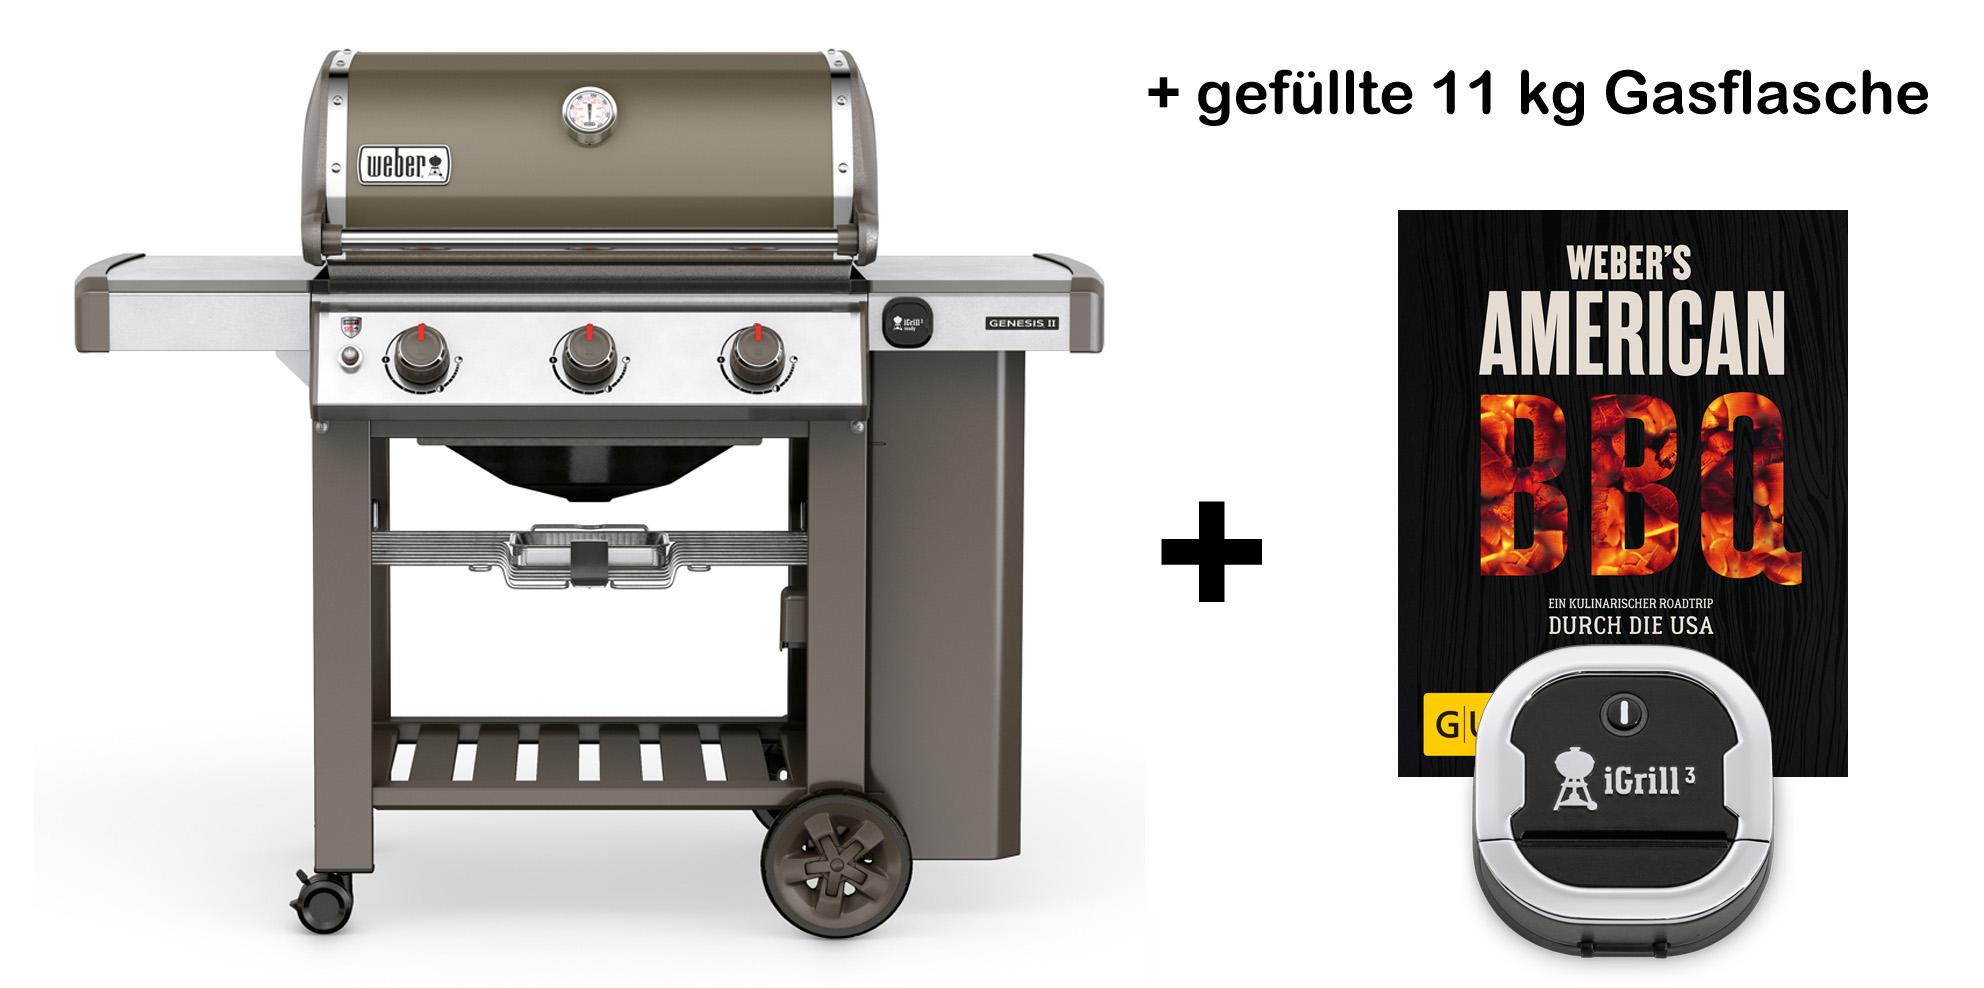 weber genesis ii e 310 2018 gbs gasgrill smoke grey inkl. Black Bedroom Furniture Sets. Home Design Ideas